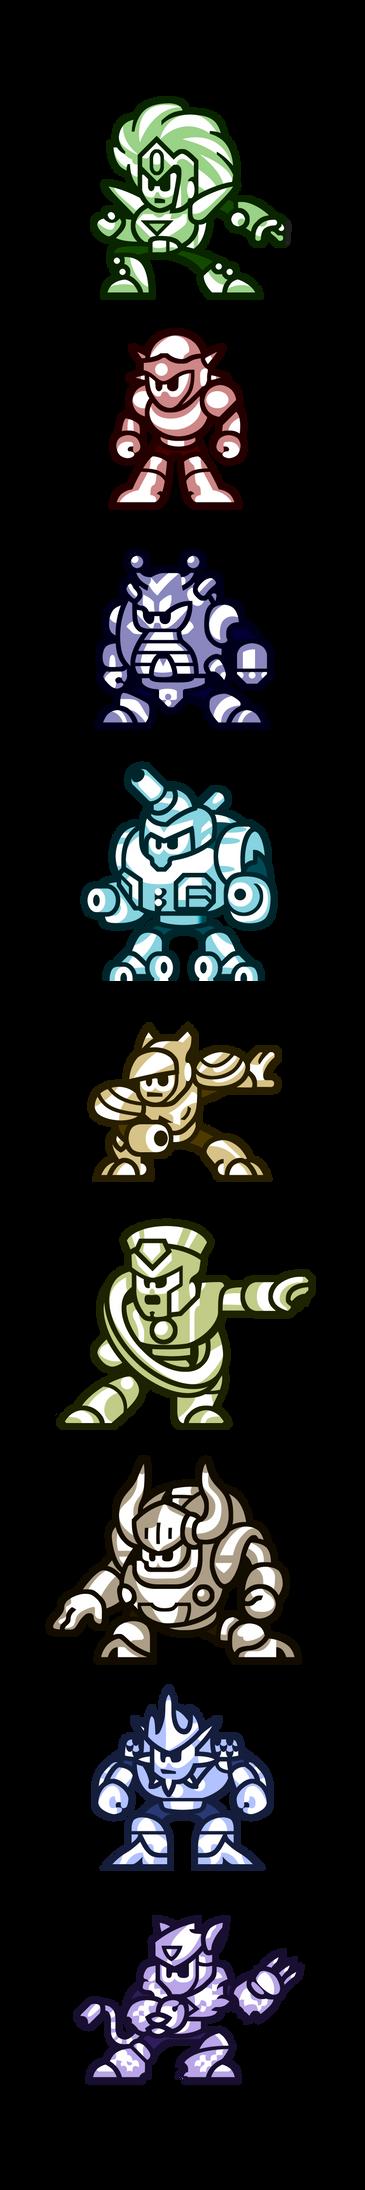 Megaman'Sprites'-Bosses of V by WaneBlade